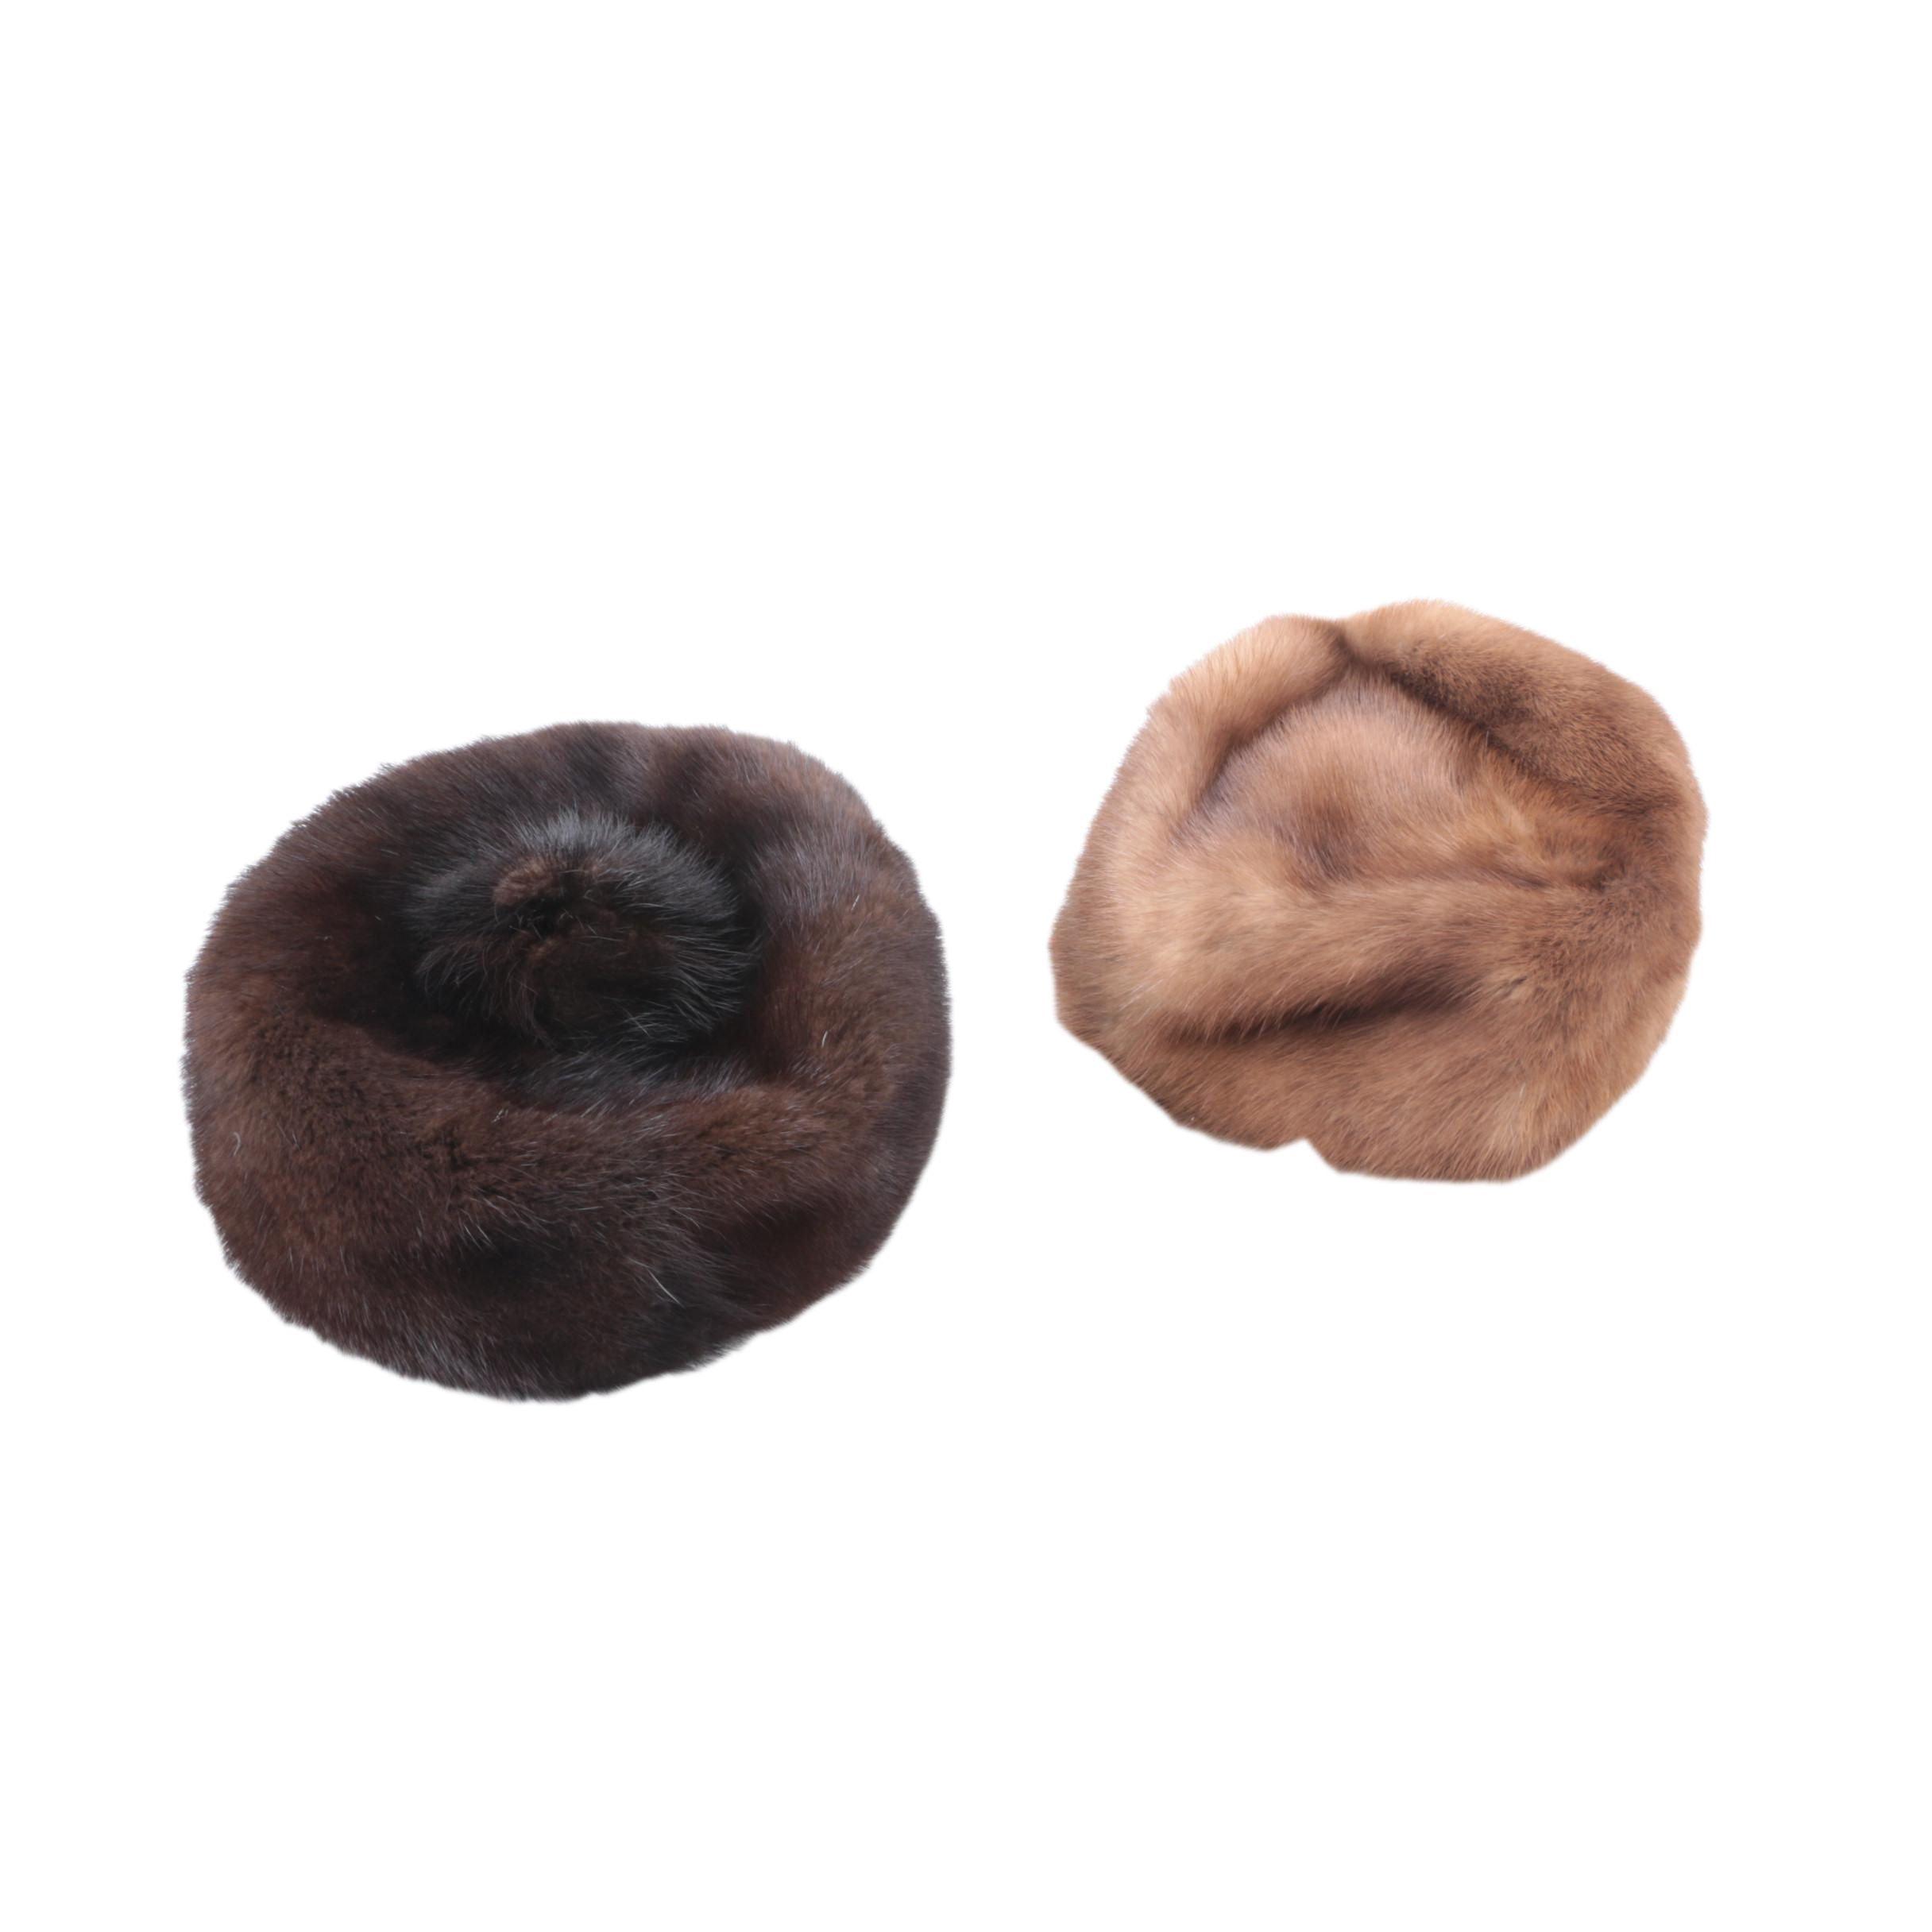 Two Mink Fur Hats